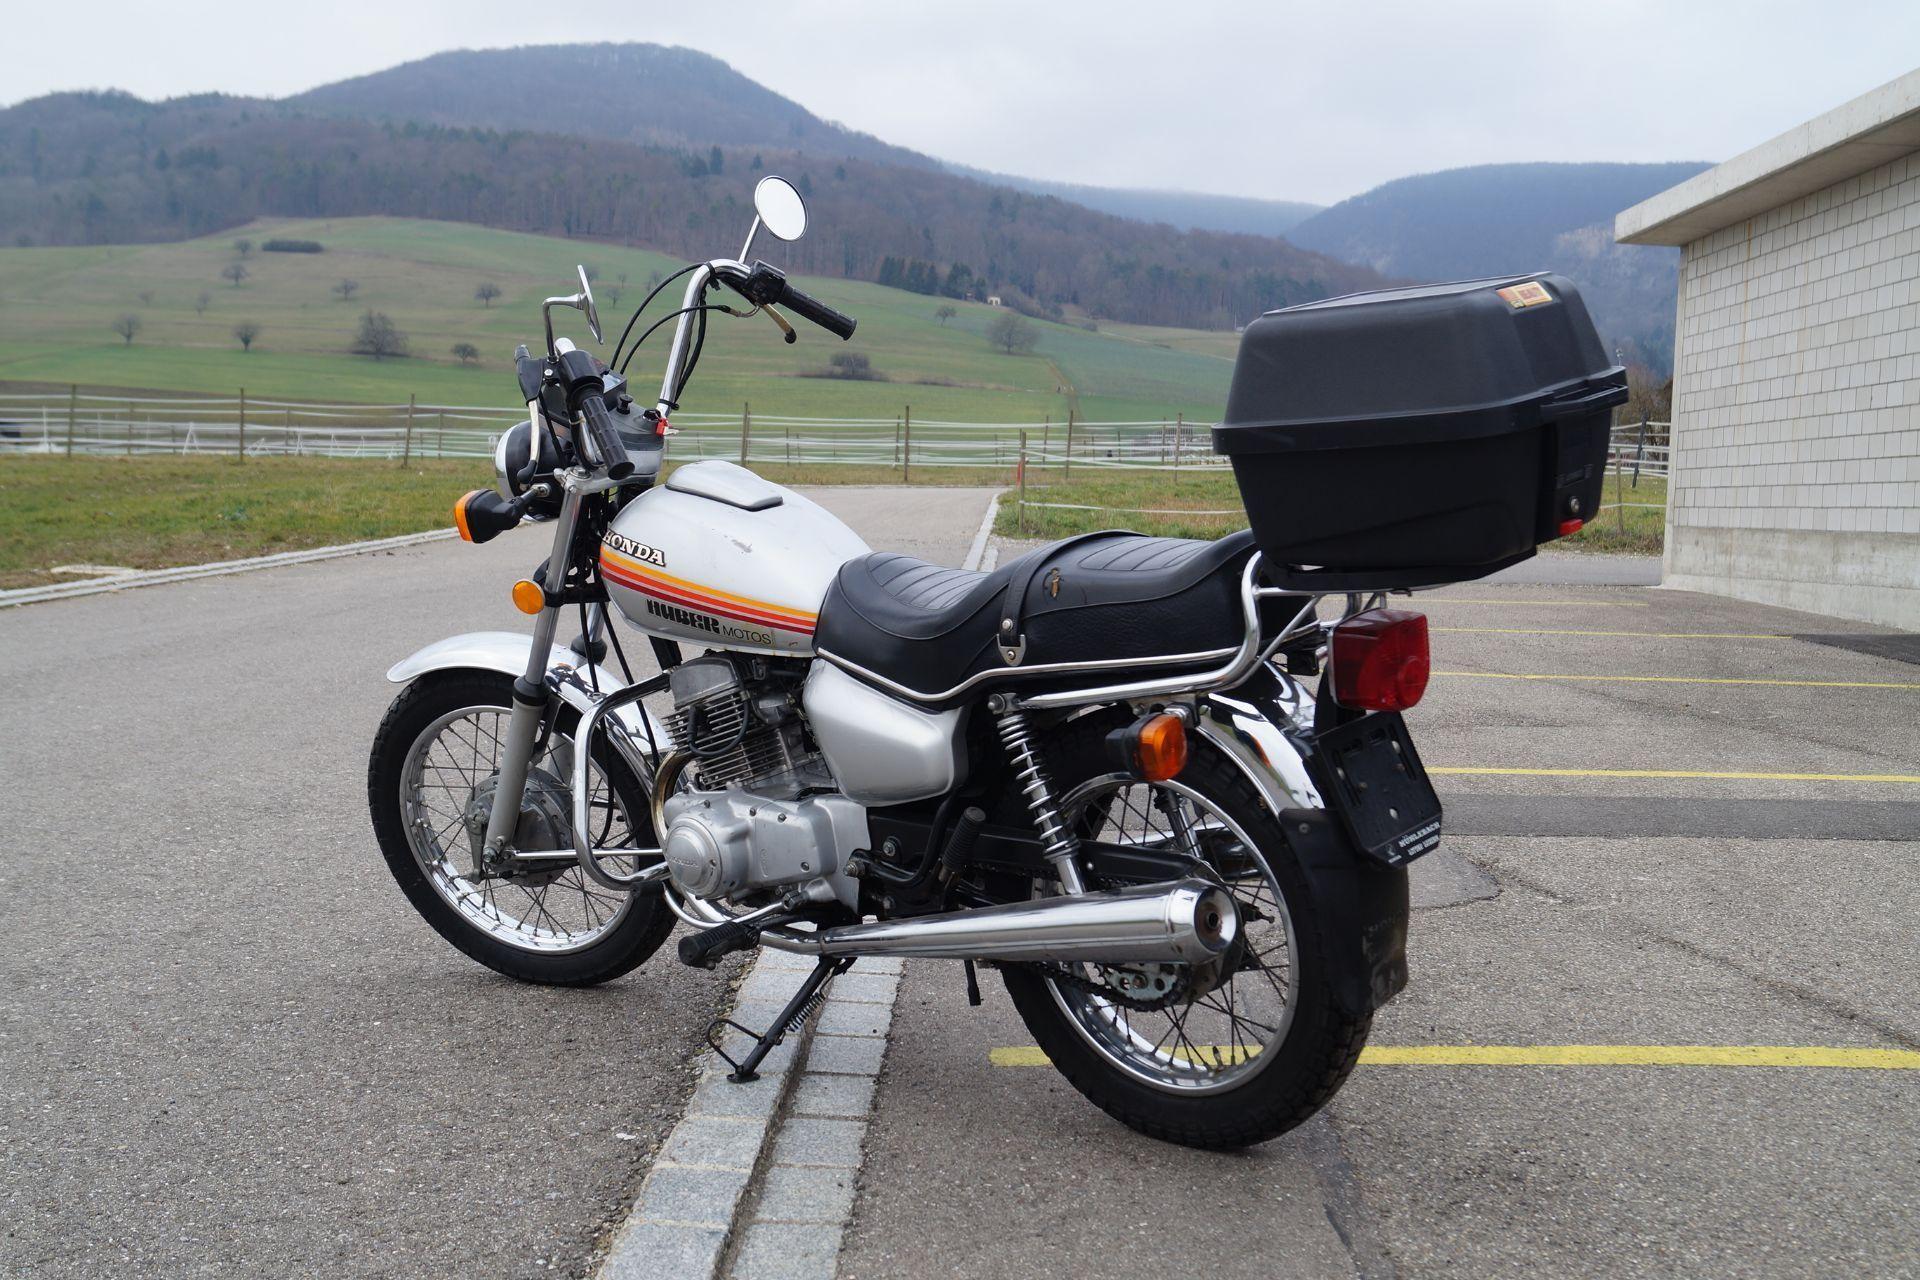 moto oldtimer acquistare honda cm 125 t motoshop ziegler. Black Bedroom Furniture Sets. Home Design Ideas